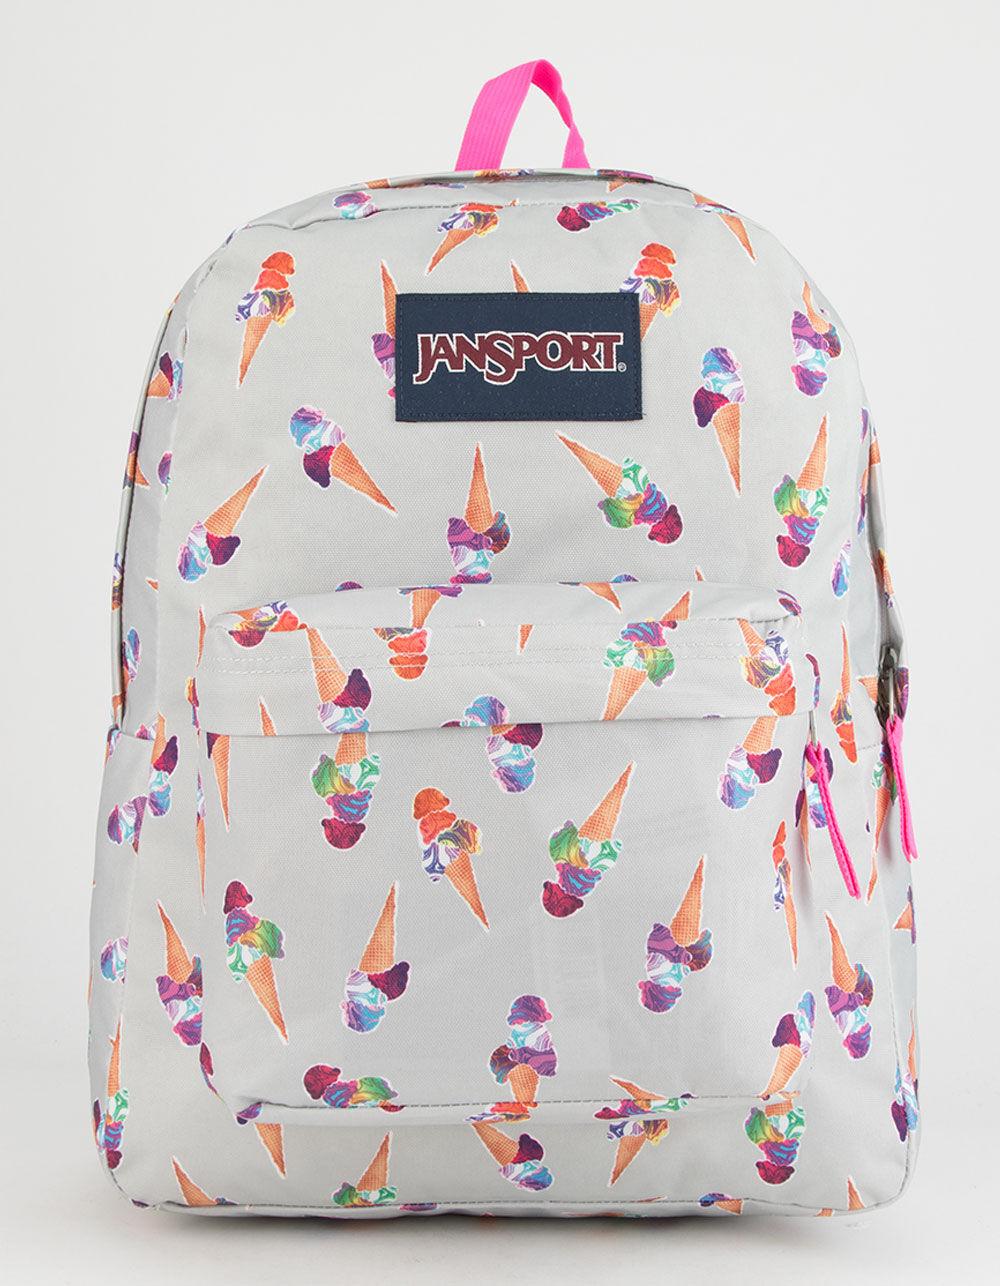 JANSPORT SuperBreak Cones And Scoops Backpack